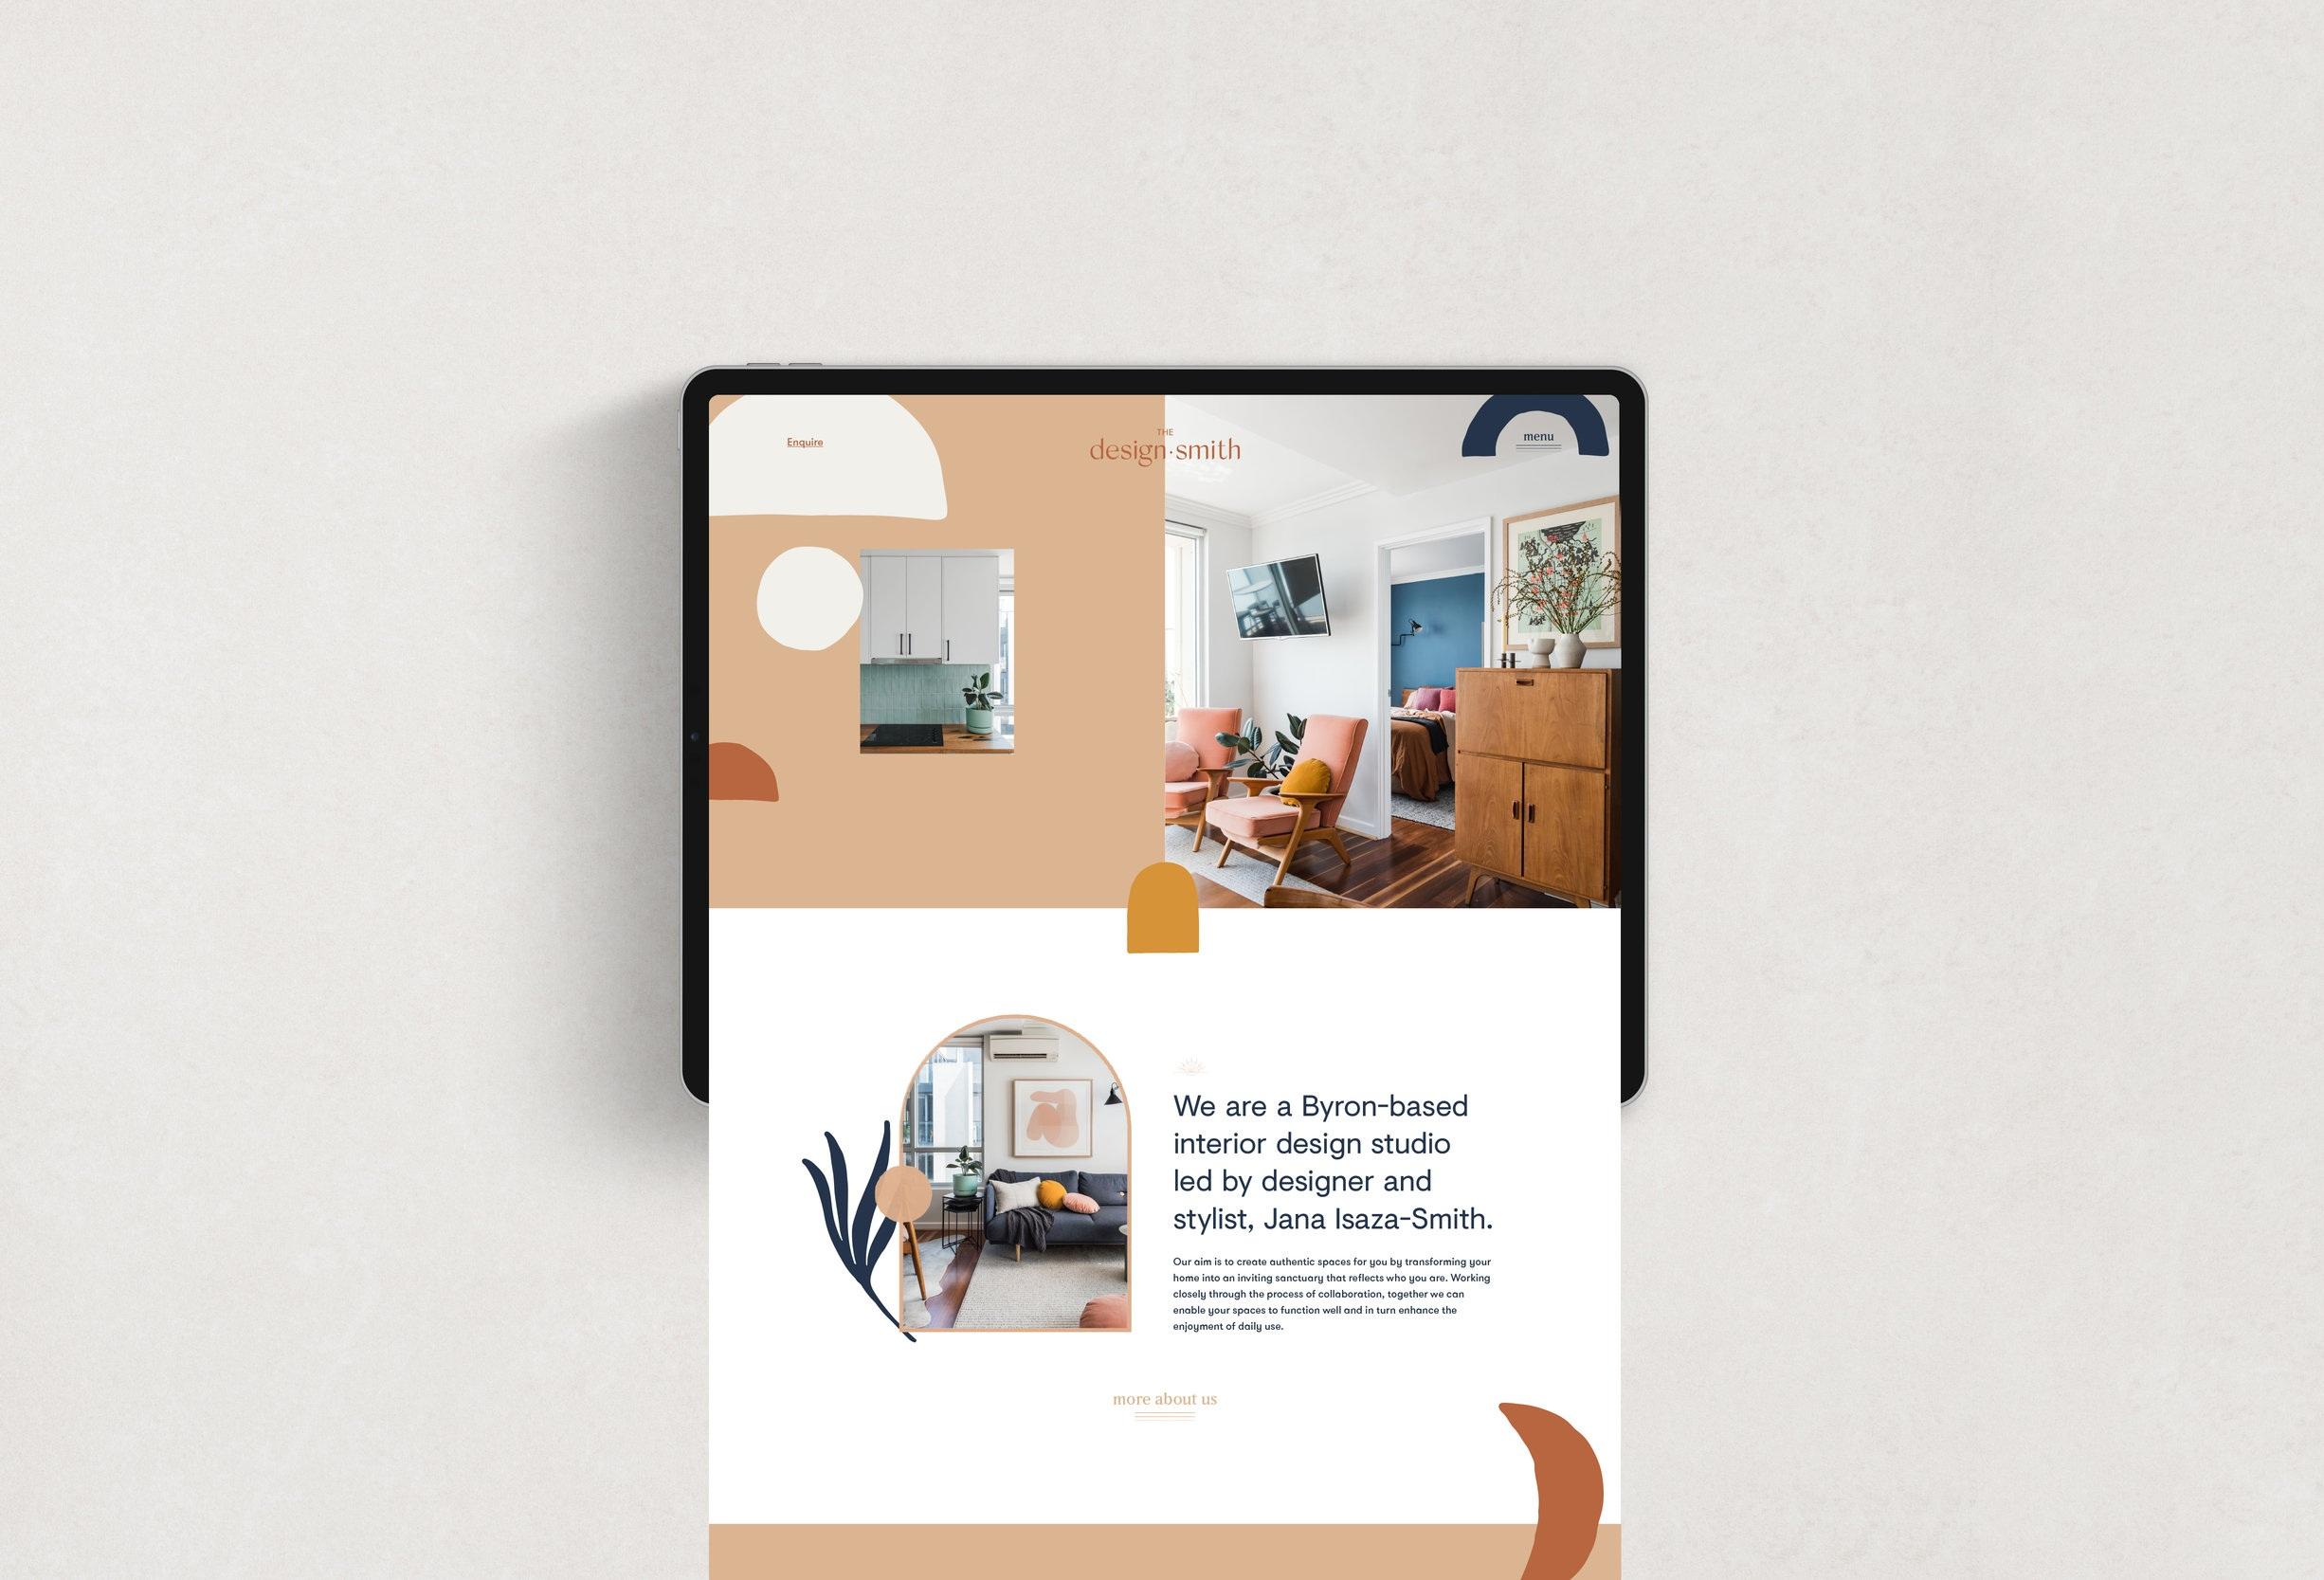 the-design-smith-byron-bay-interior-designer-squarespace-website.jpg